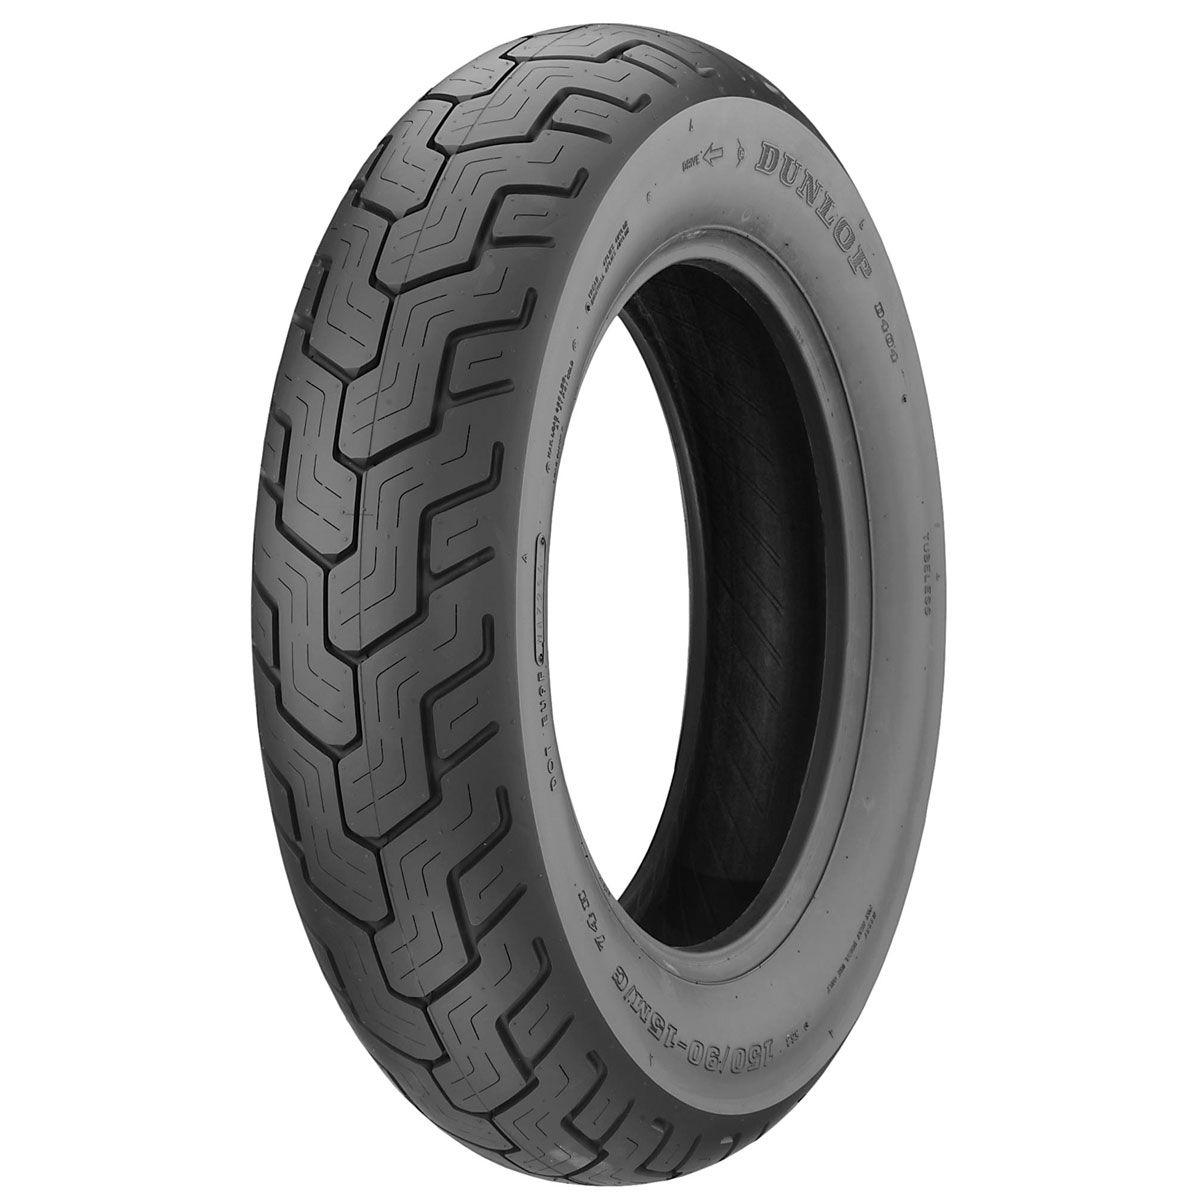 Buy Dunlop D404 Rear 150 80 16 Tires Simpletire In 2021 Motorcycle Tires Tire Dunlop